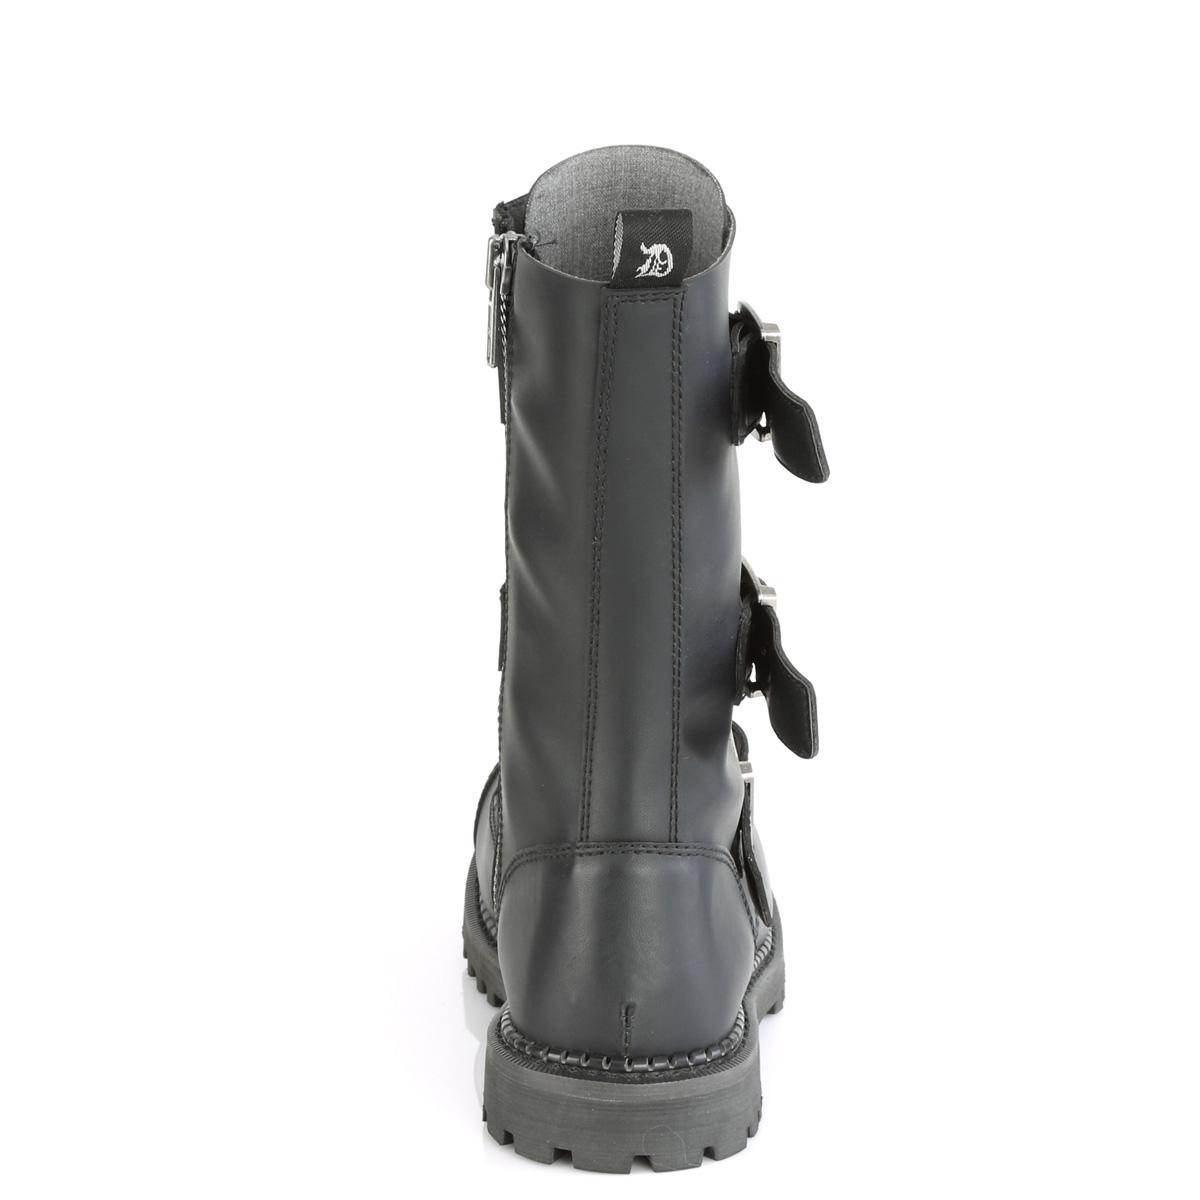 Demonia(デモニア) RIOT-12BK スティールトゥ バックルストラップ&編み上げブーツ 12アイレット コンバットブーツ ヴィーガンレザー(合皮) #Men's/Unisex◆取り寄せ